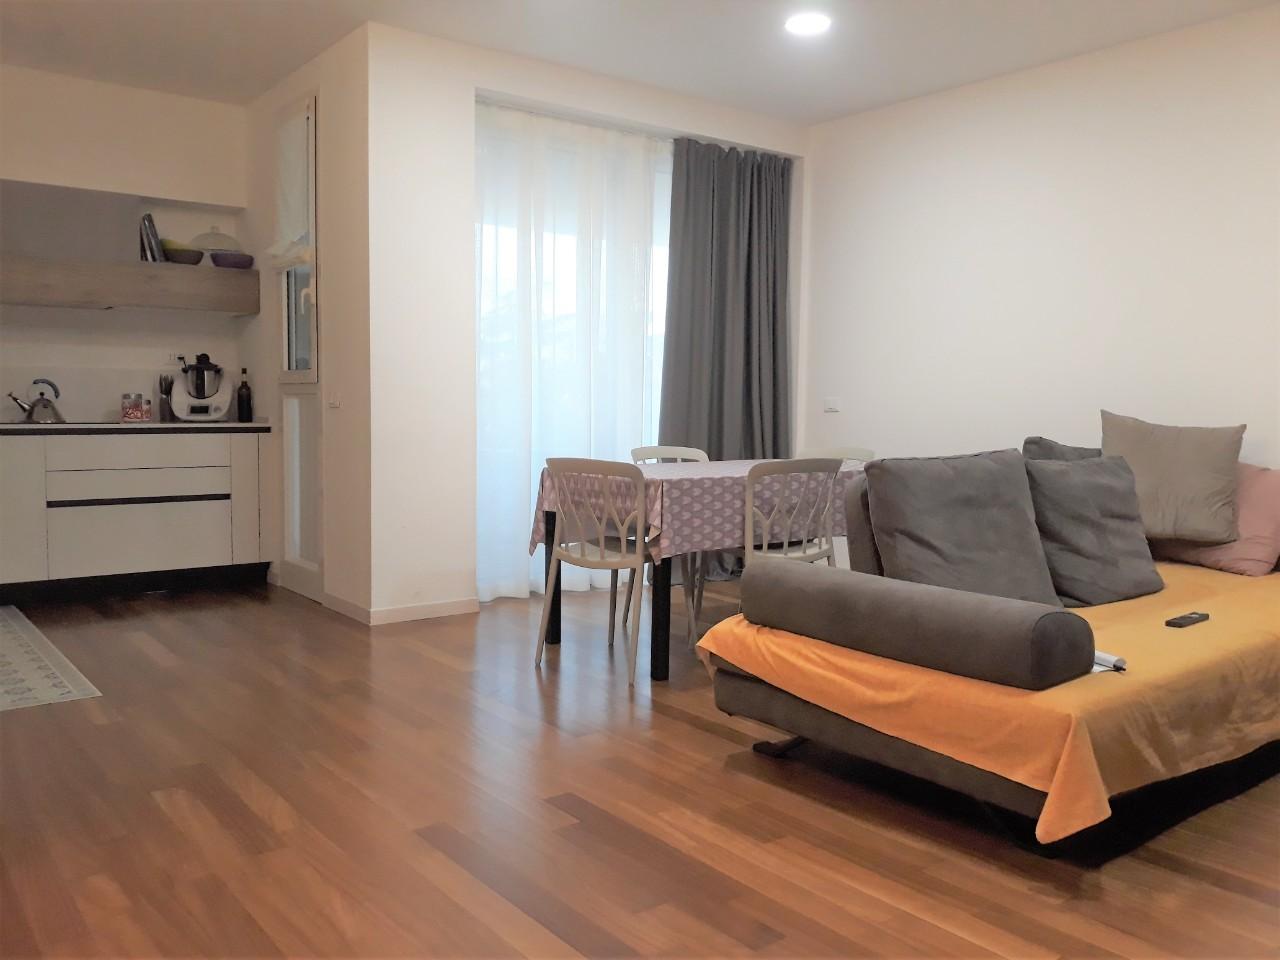 Appartamento in vendita Forli Zona Villanova